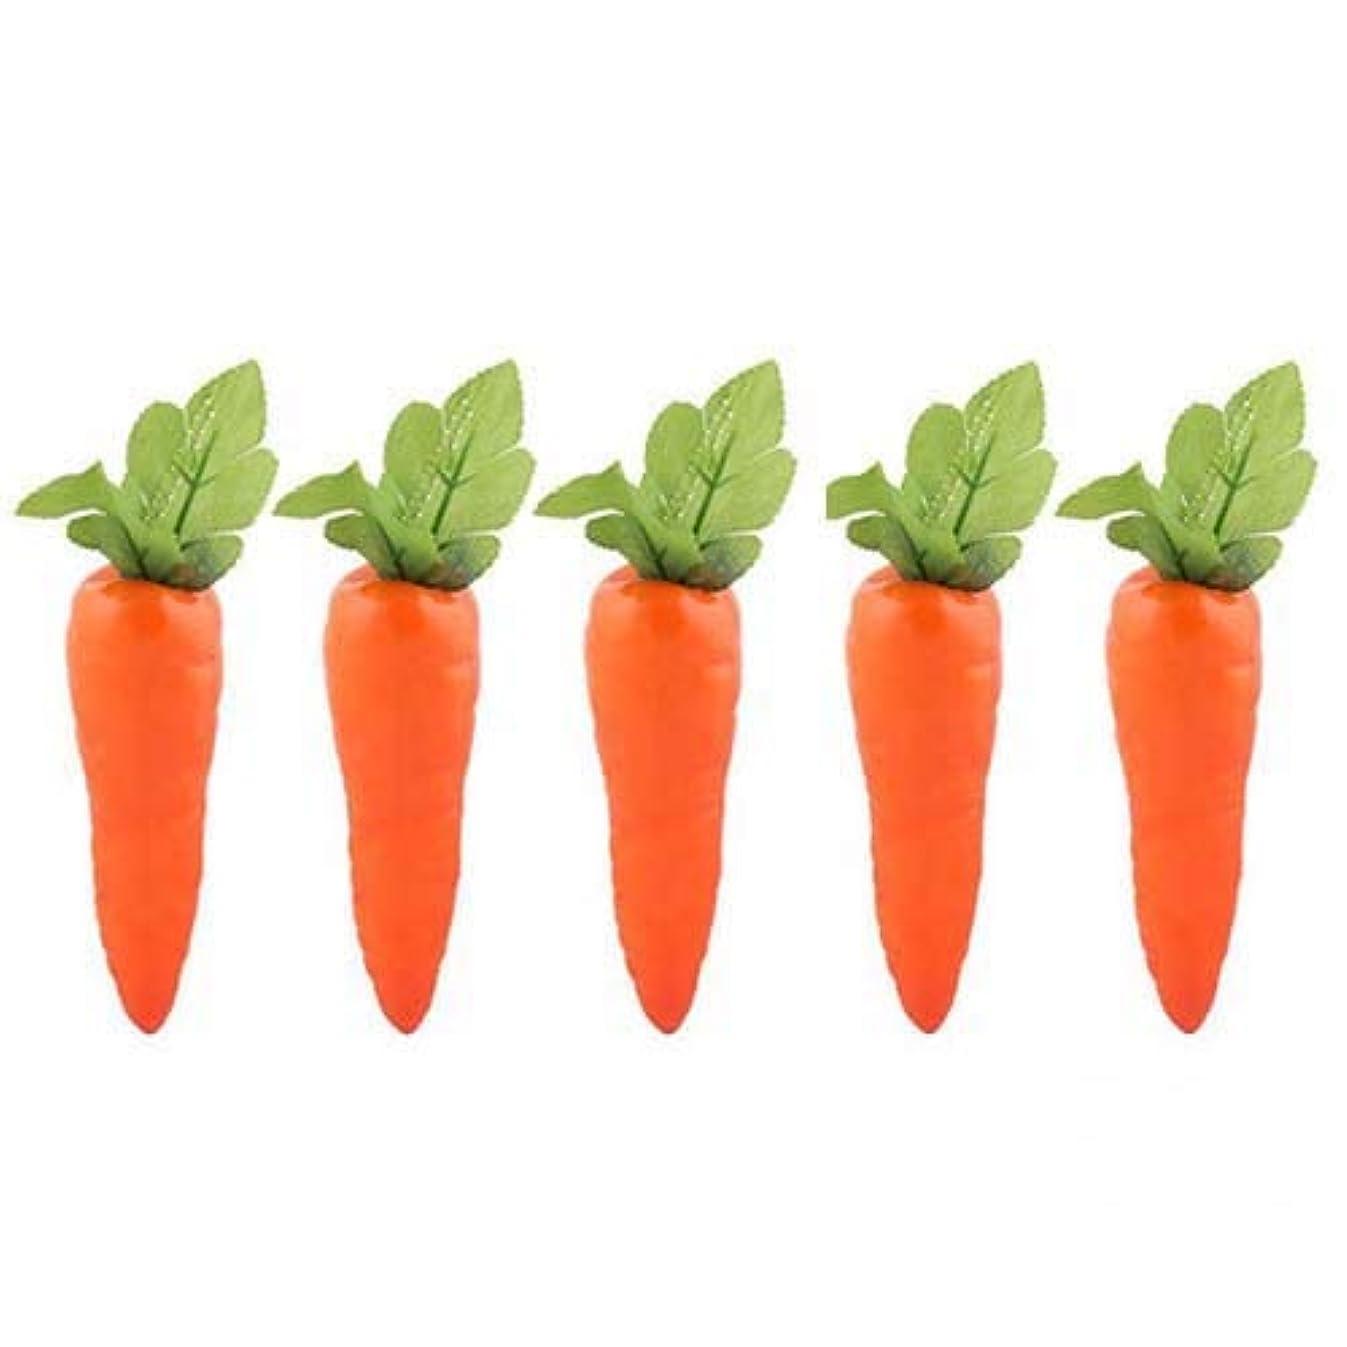 Lorigun 5 Pcs Simulation Carrots Artificial Vegetables Home&Kitchen Decorations